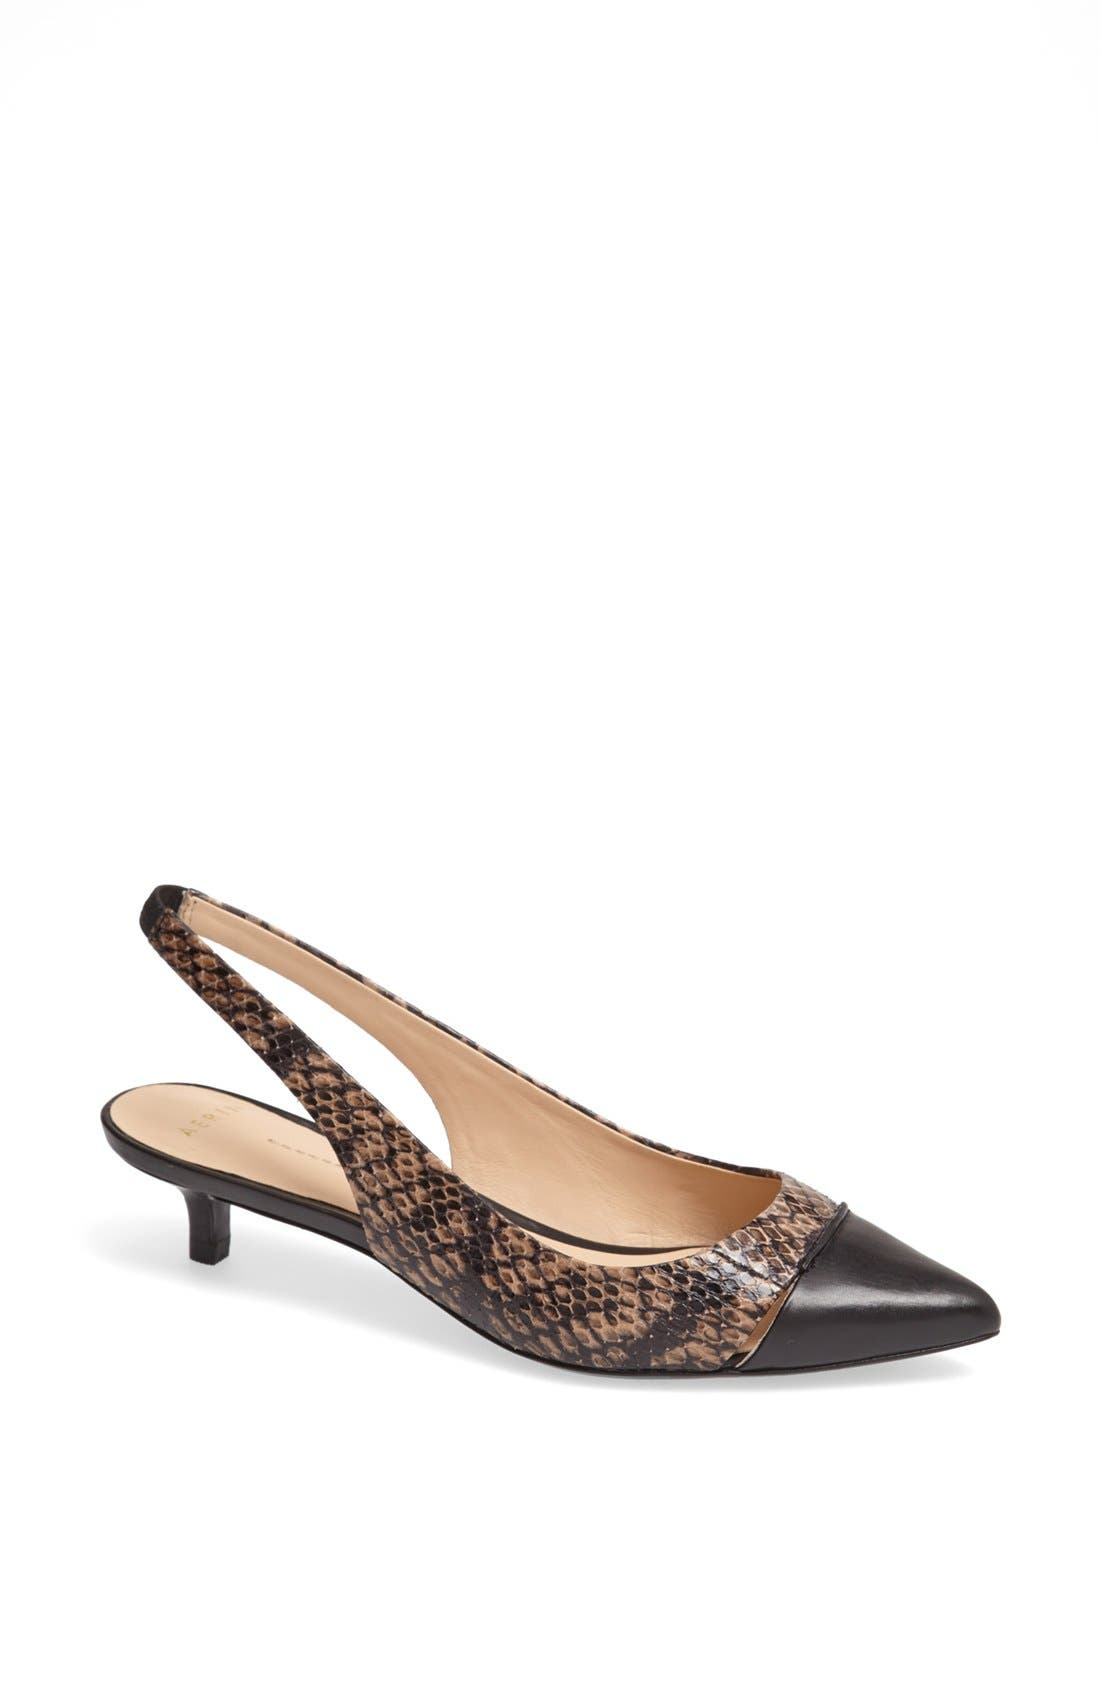 Alternate Image 1 Selected - Aerin 'Padima' Kitten Heel Sandal